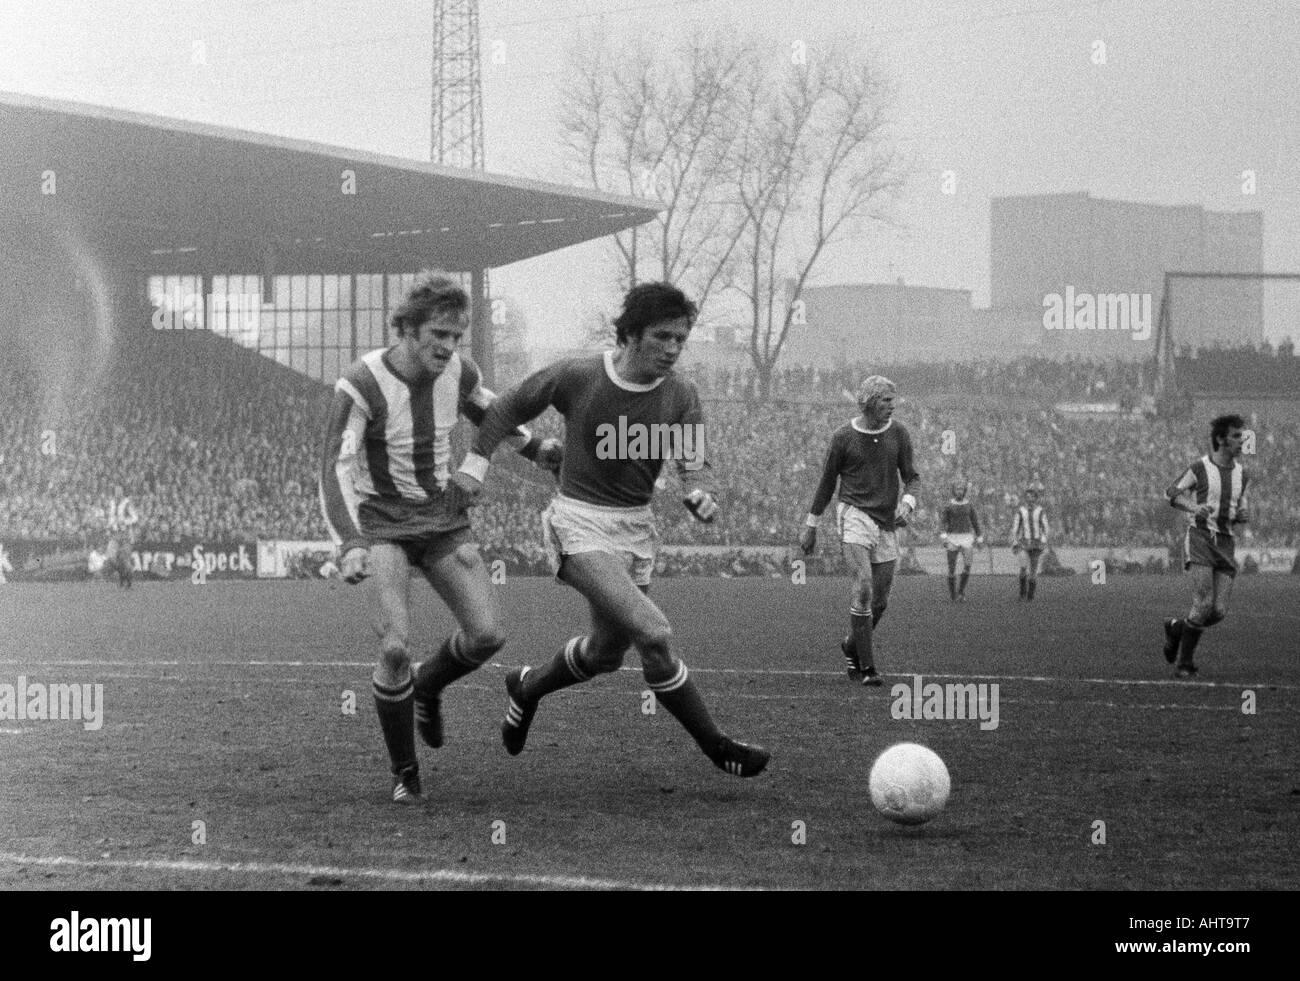 football, Bundesliga, 1971/1972, FC Schalke 04 versus 1. FC Kaiserslautern 3:0, Stadium Glueckaufkampfbahn in Gelsenkirchen, scene of the match, f.l.t.r. Klaus Ackermann (FCK), Heinz van Haaren, Rolf Ruessmann (both S04) - Stock Image